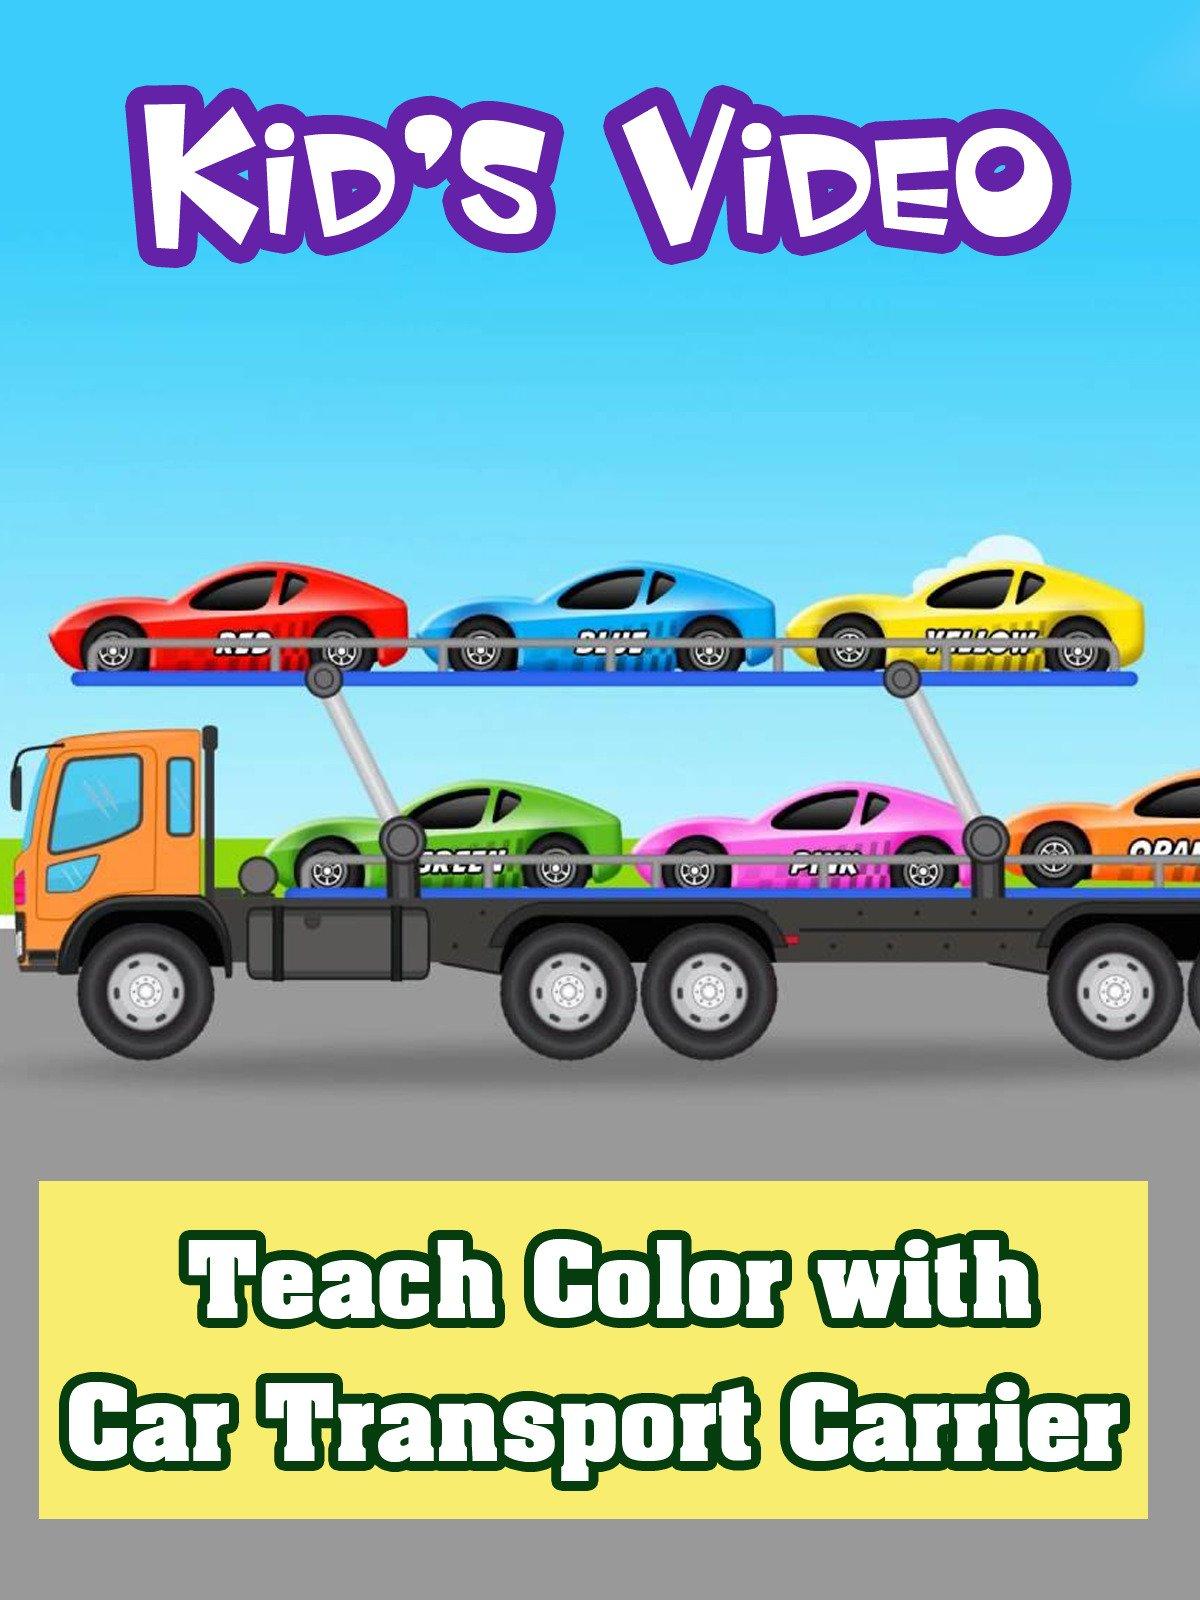 Teach Color with Car Transport Carrier